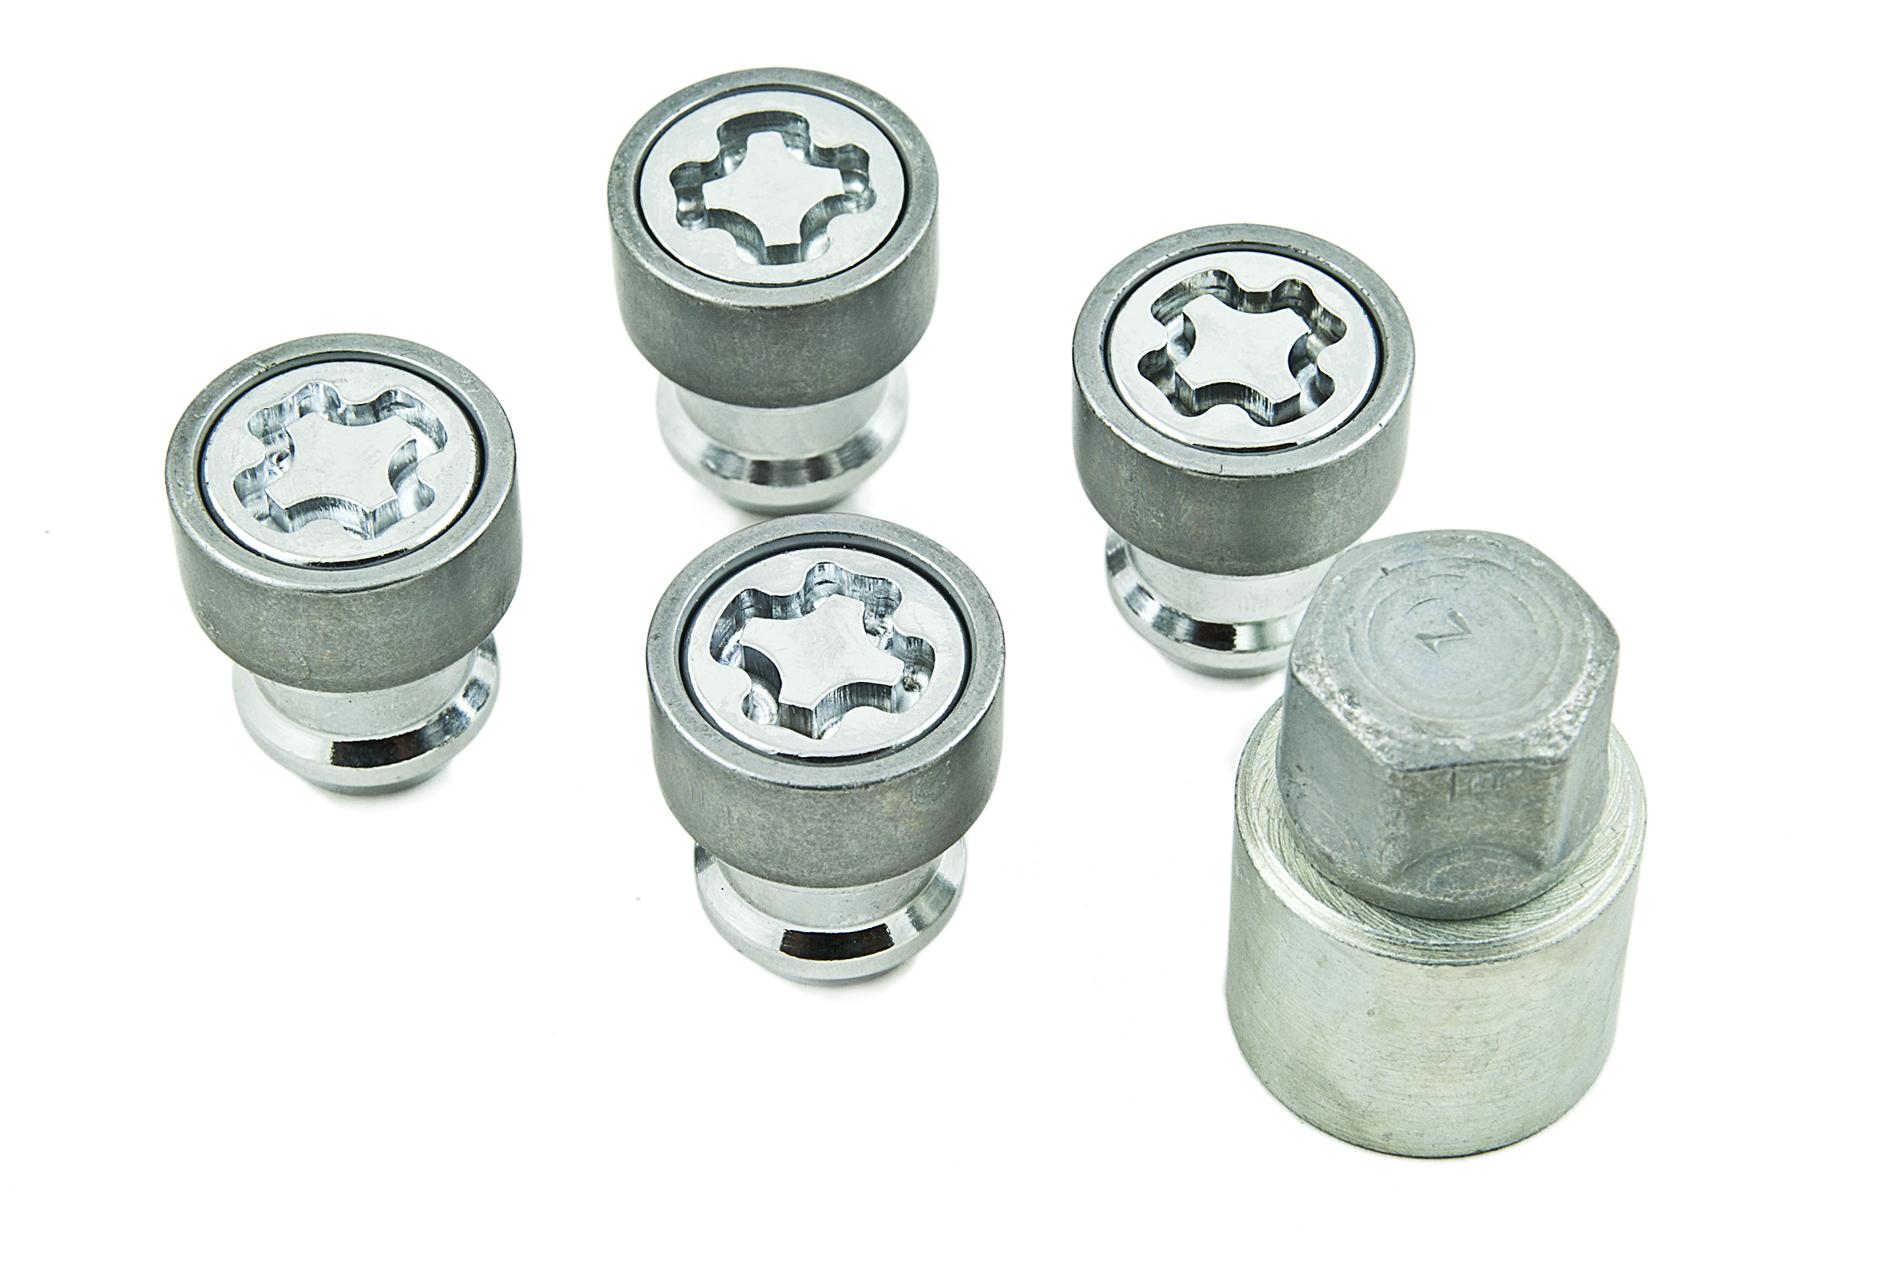 nissan genuine alloy wheel locking wheel nuts bolts lock set key  ebay